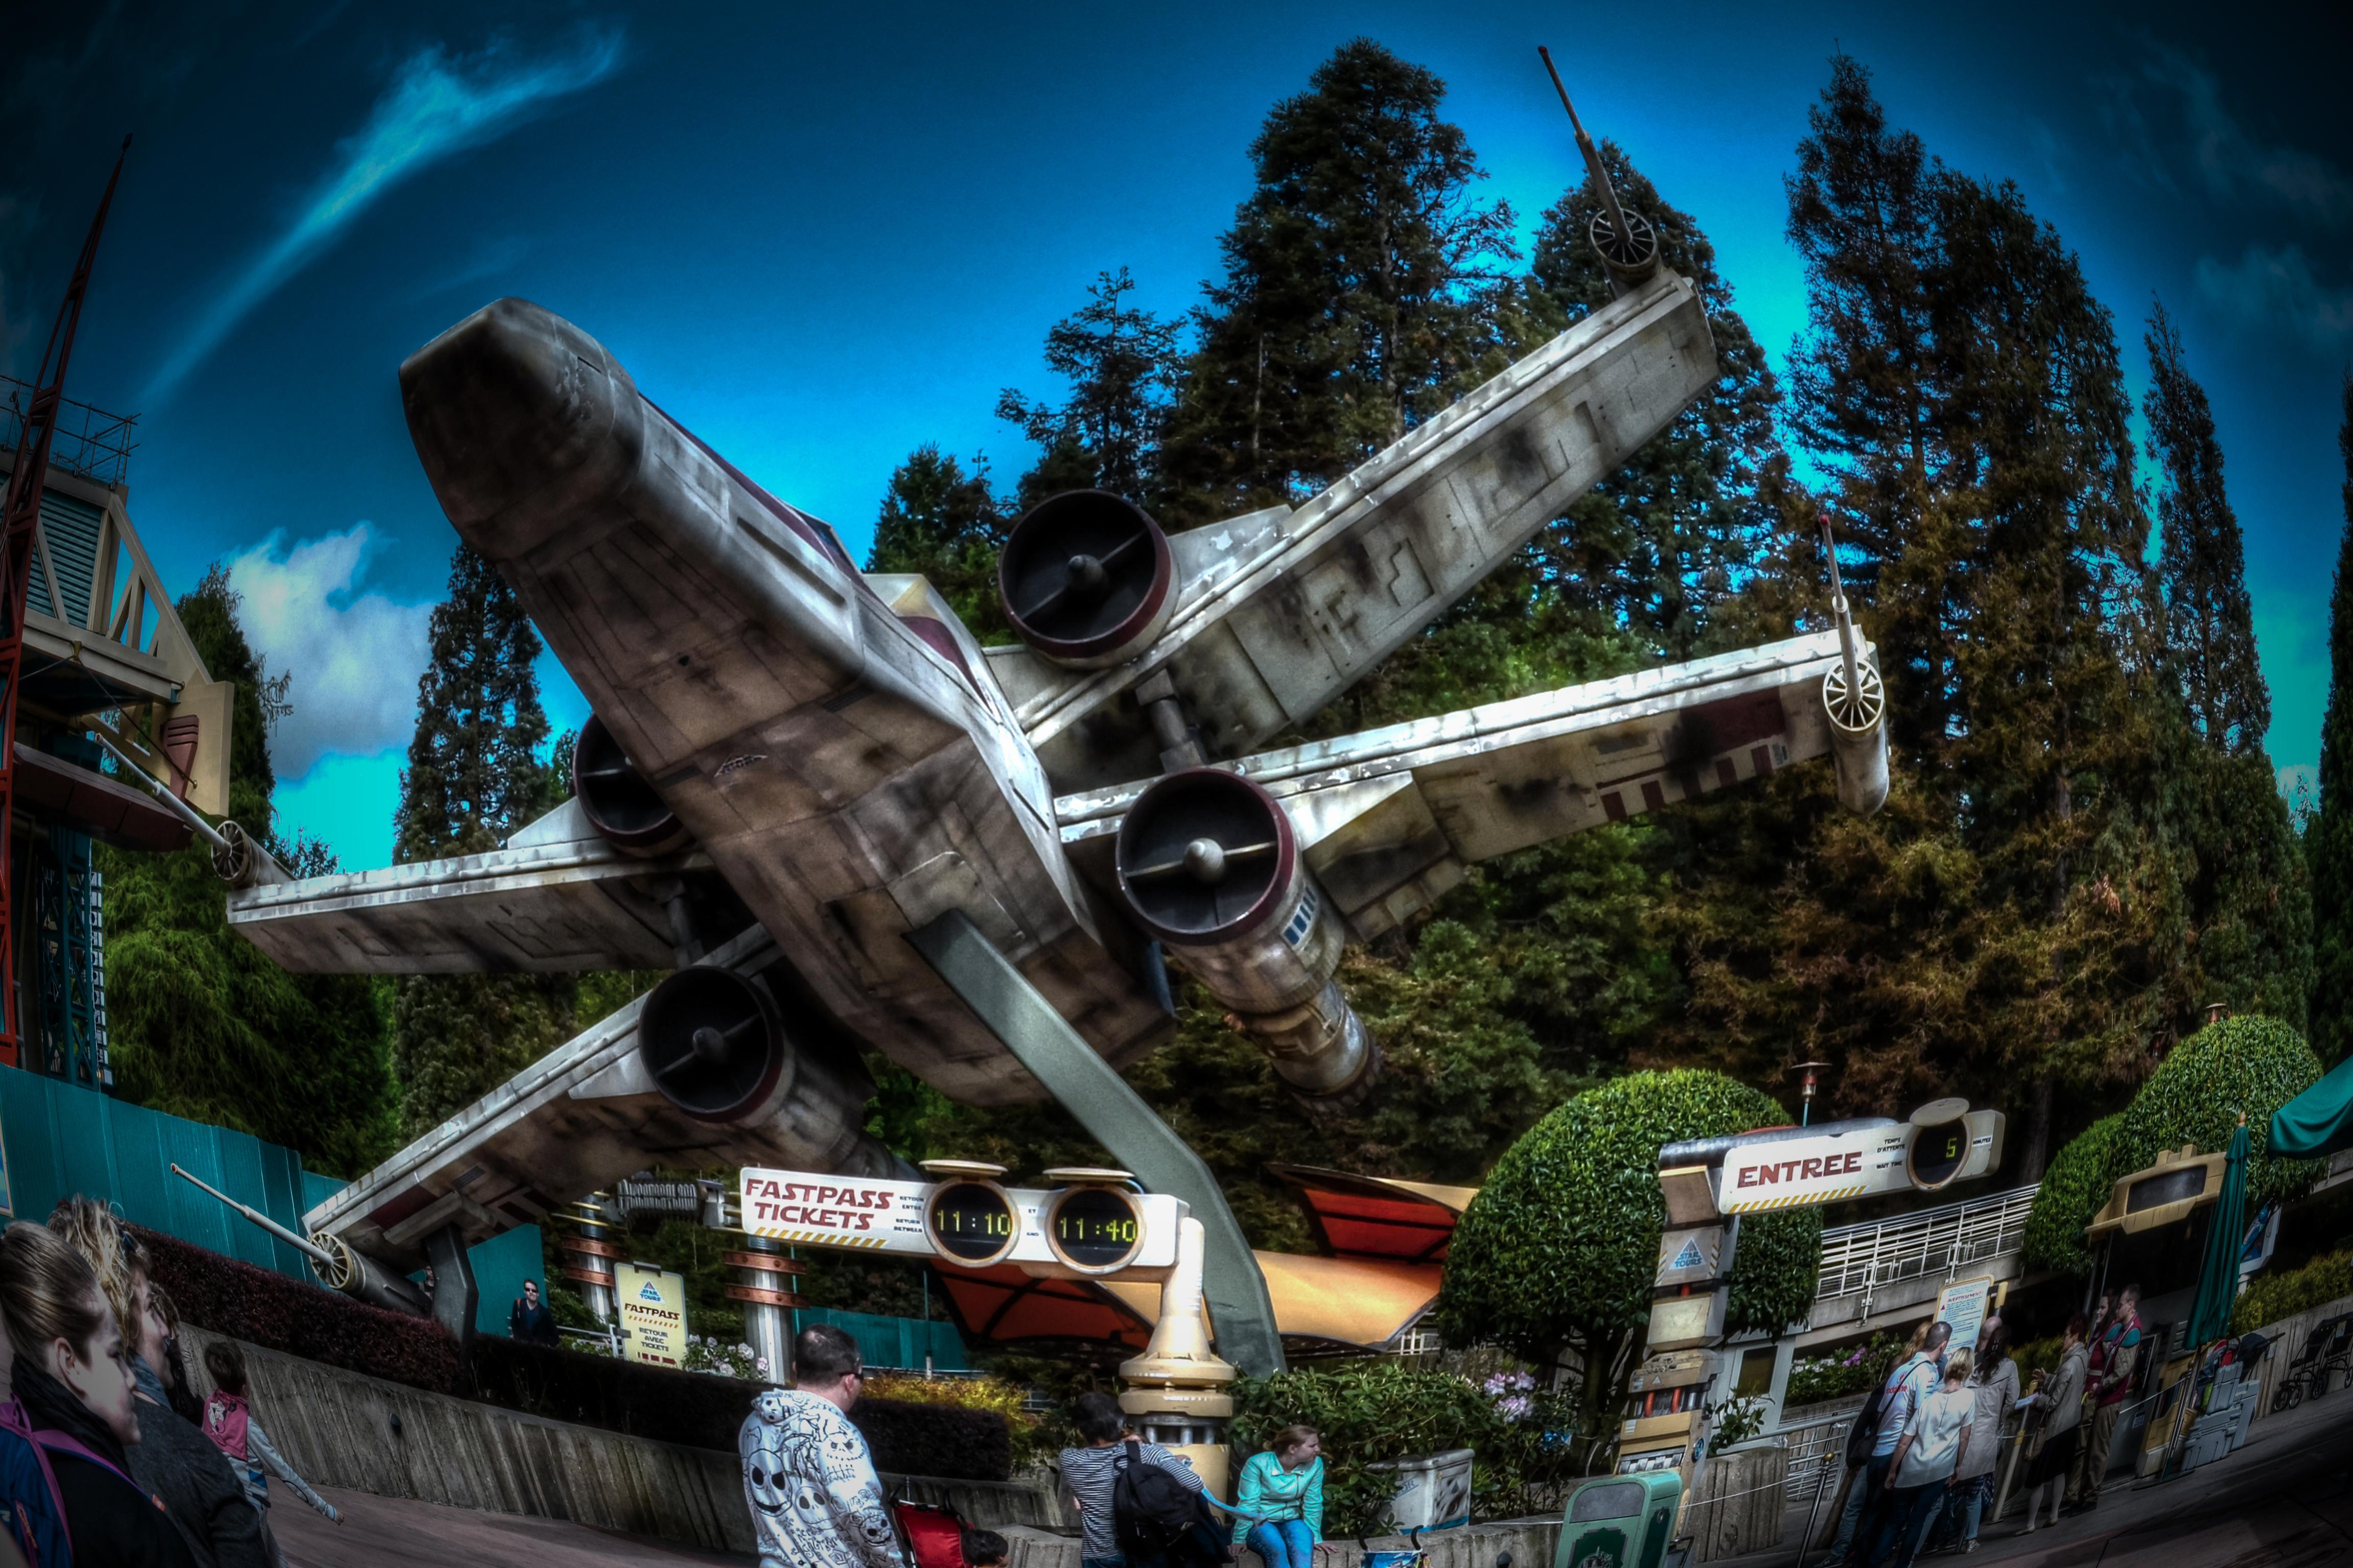 Photos de Disneyland Paris en HDR (High Dynamic Range) ! - Page 40 1431165121-dsc-1072